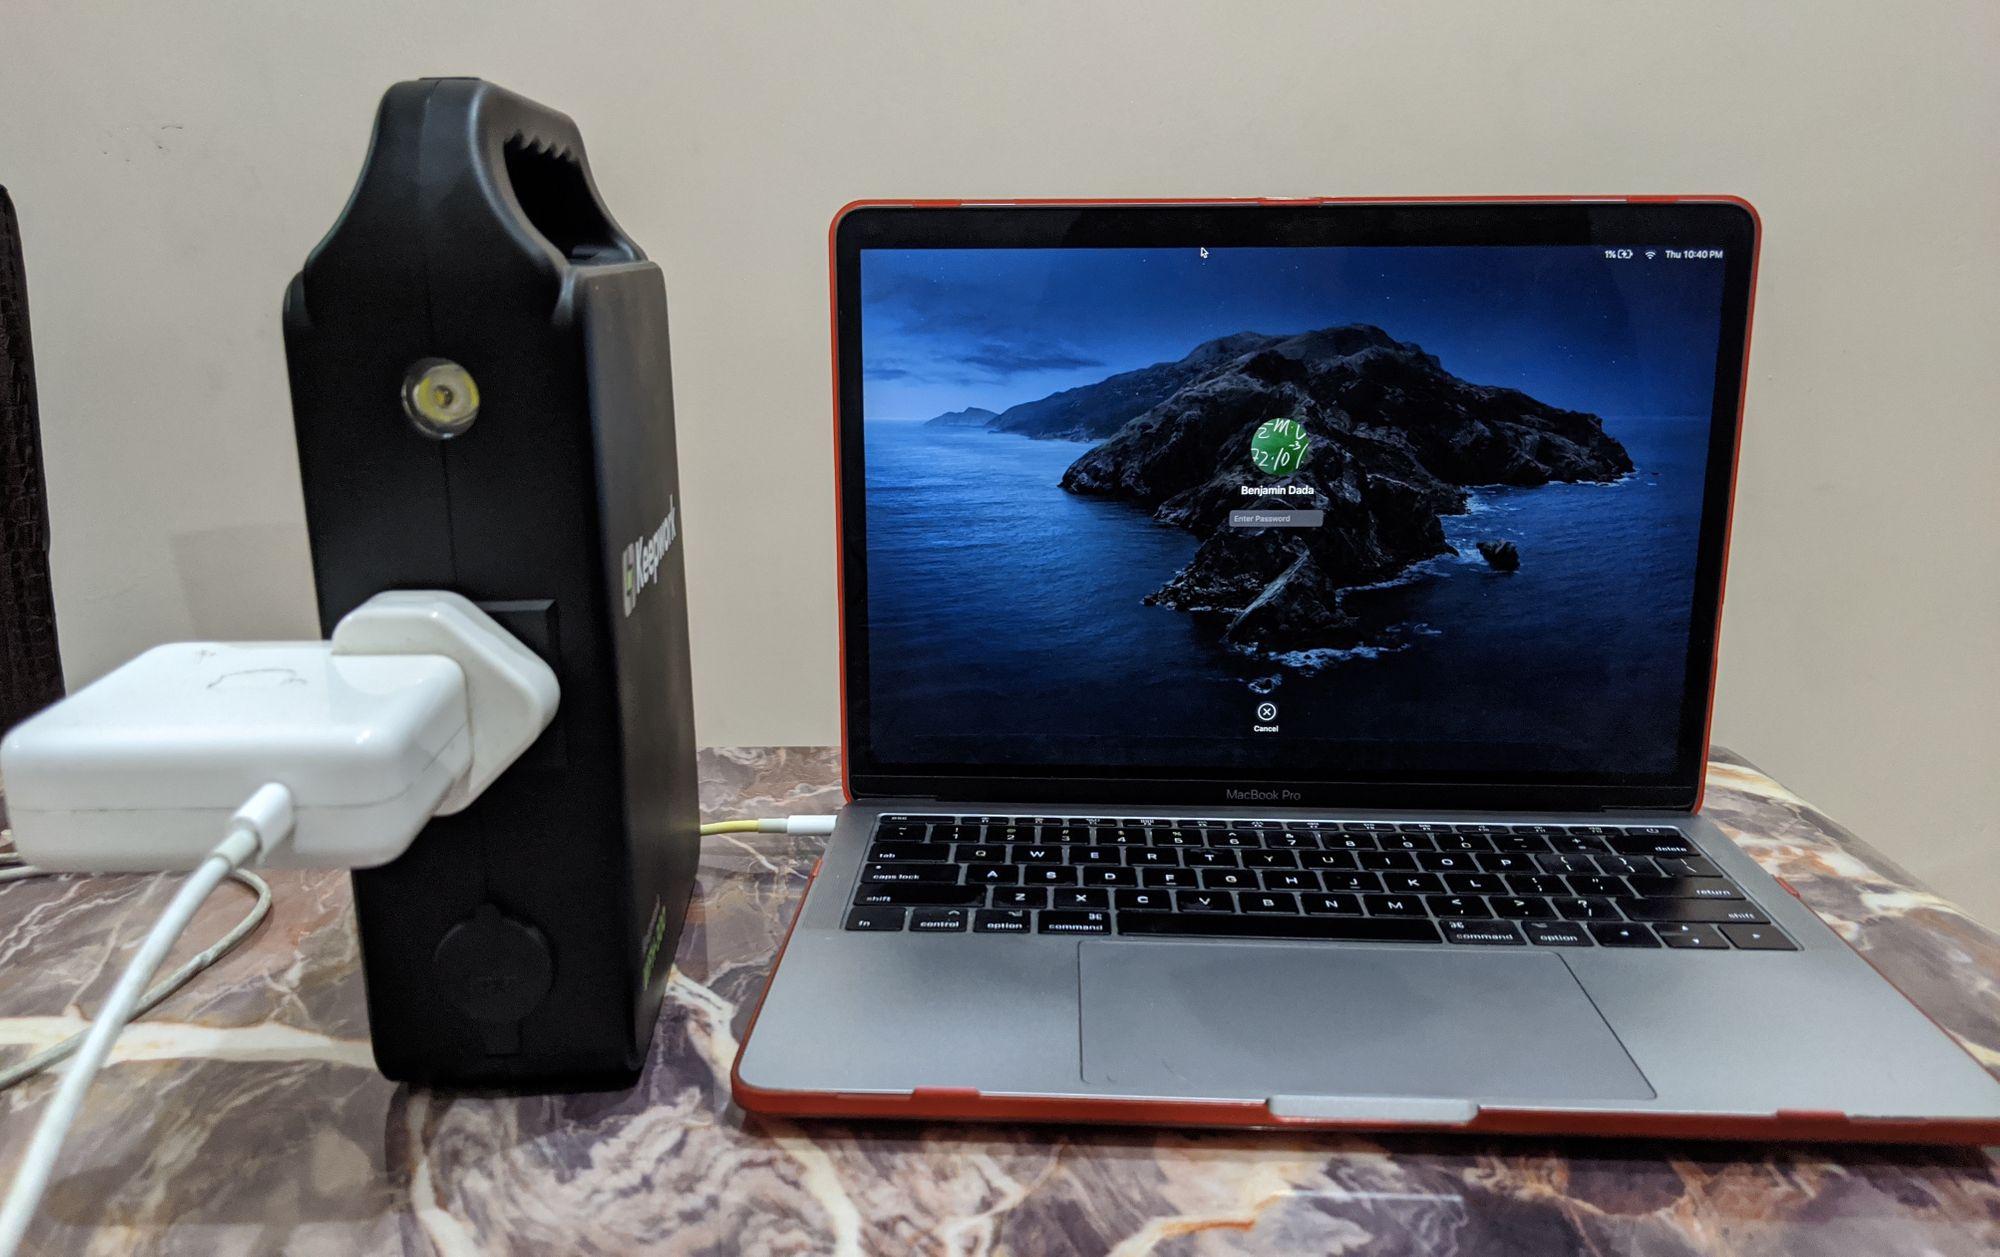 Macbook plugged into Keepwork device